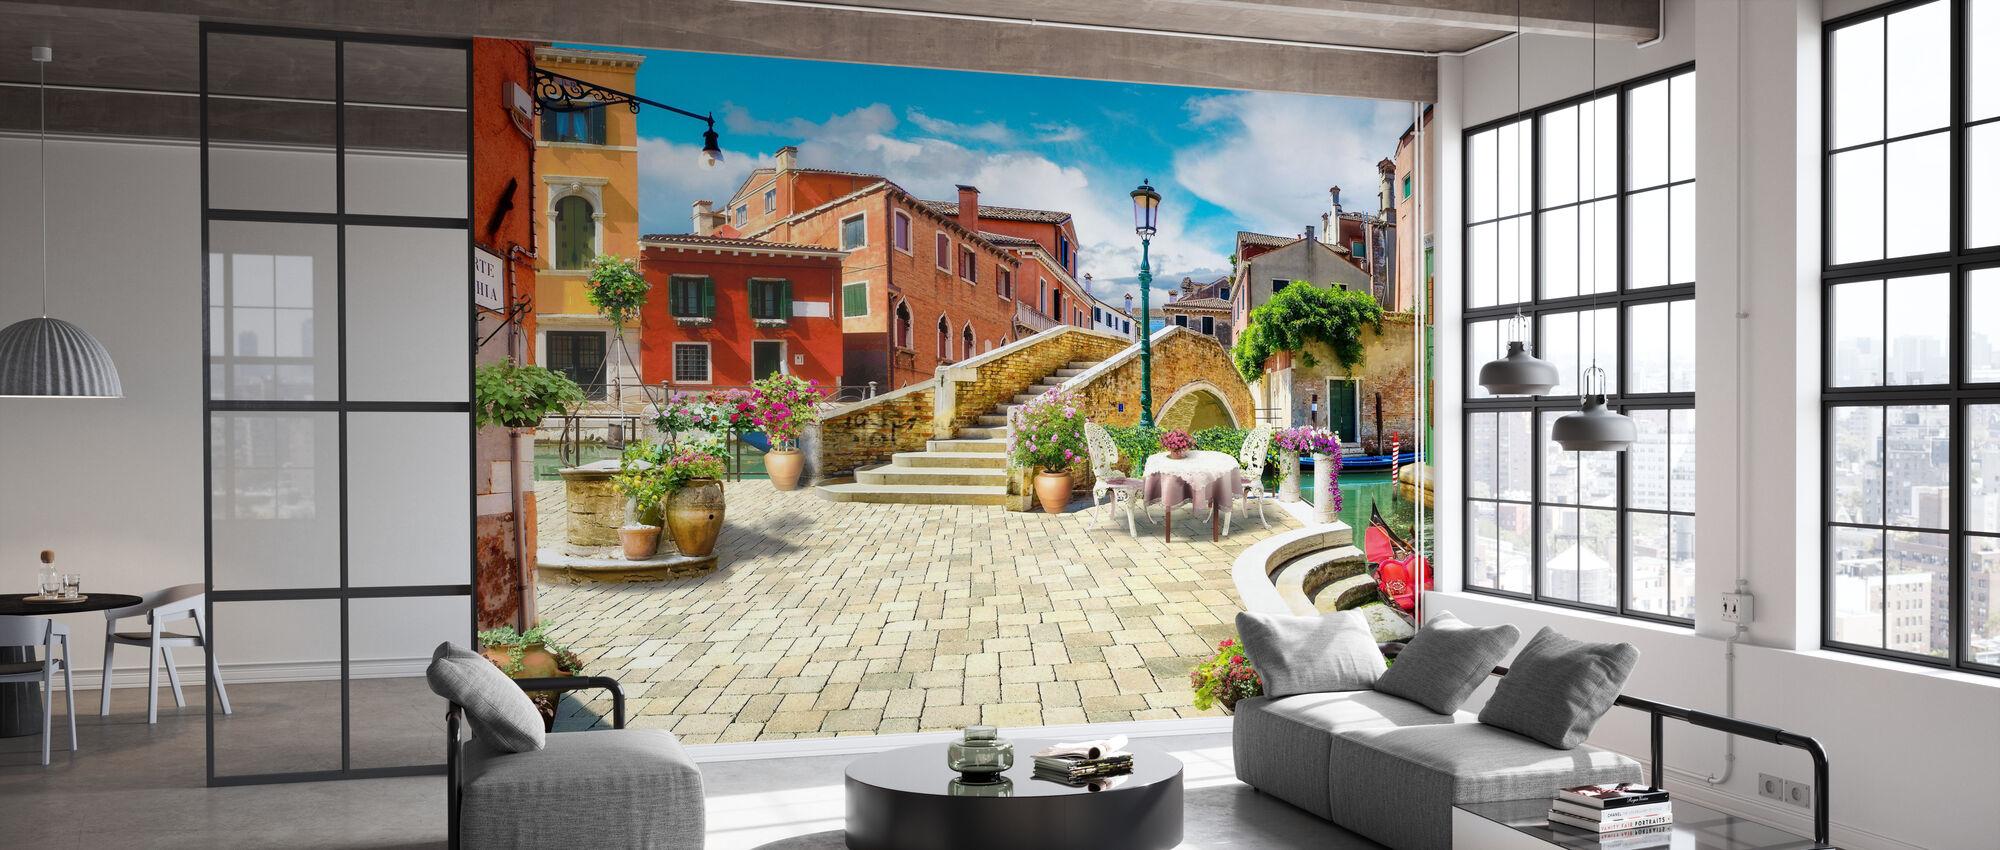 Venice Bridge II - Wallpaper - Office